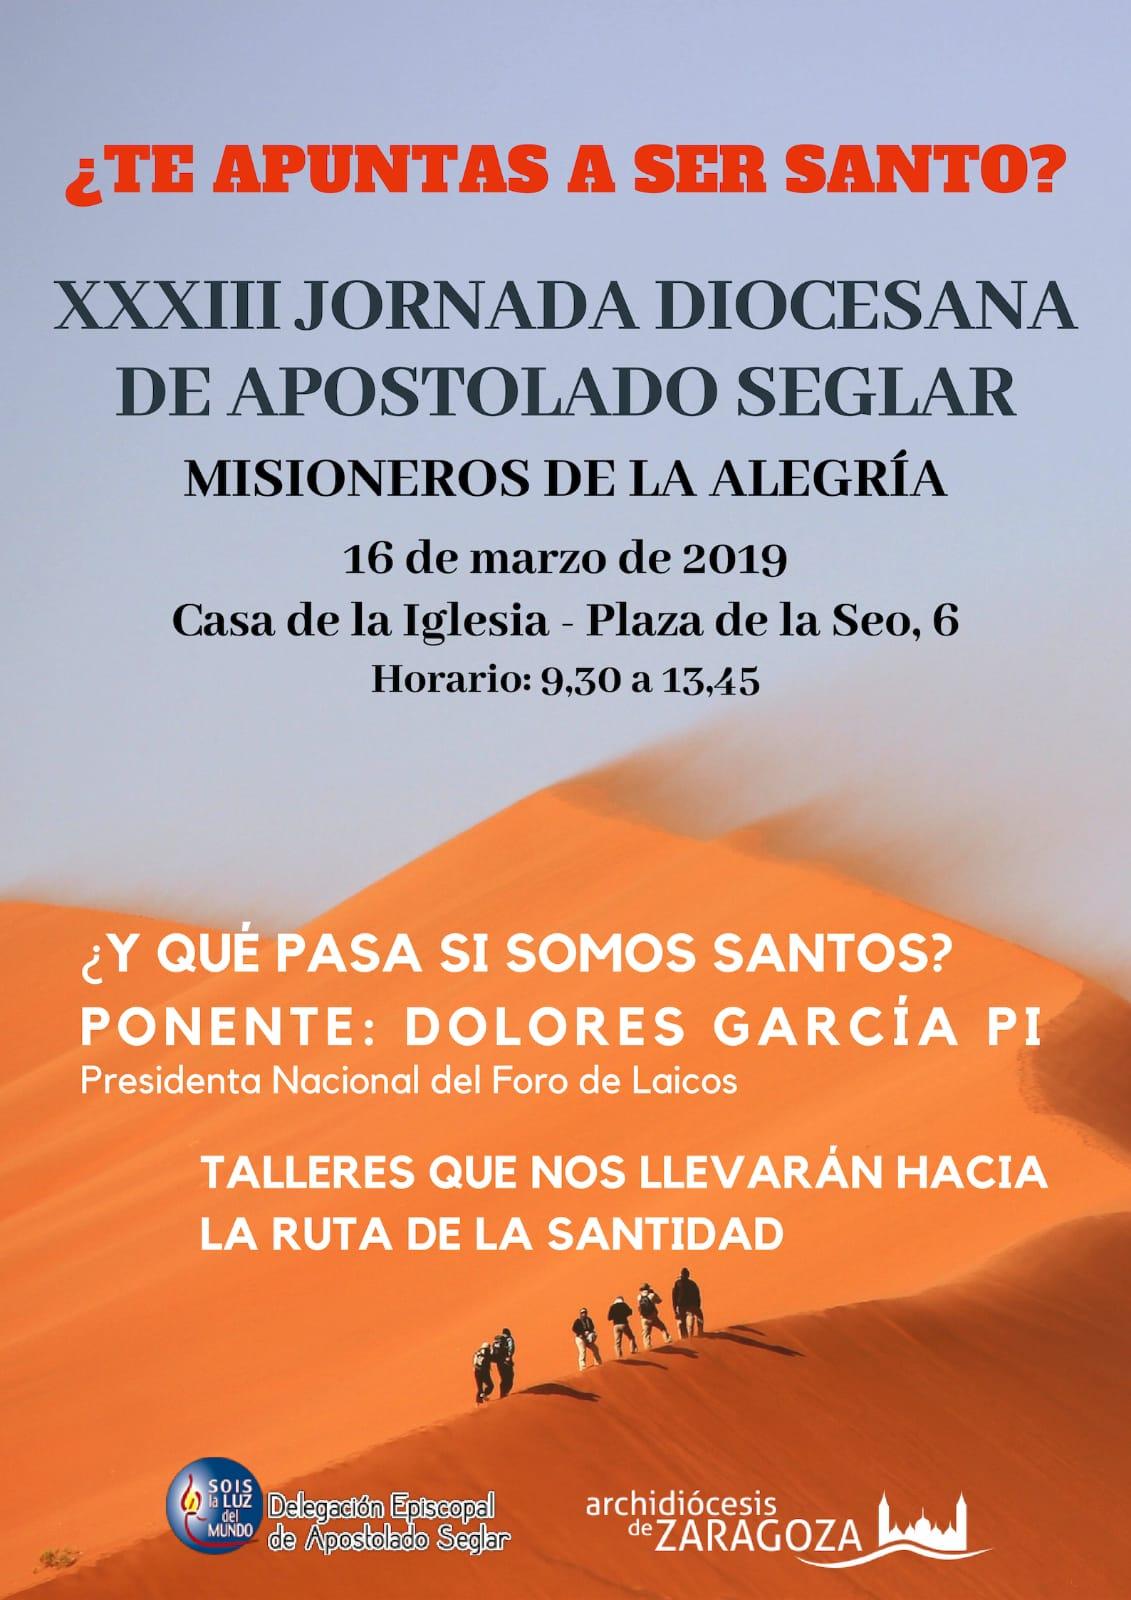 2019.03.16-Jornada Apostolado Seglar Zaragoza 3.jpg